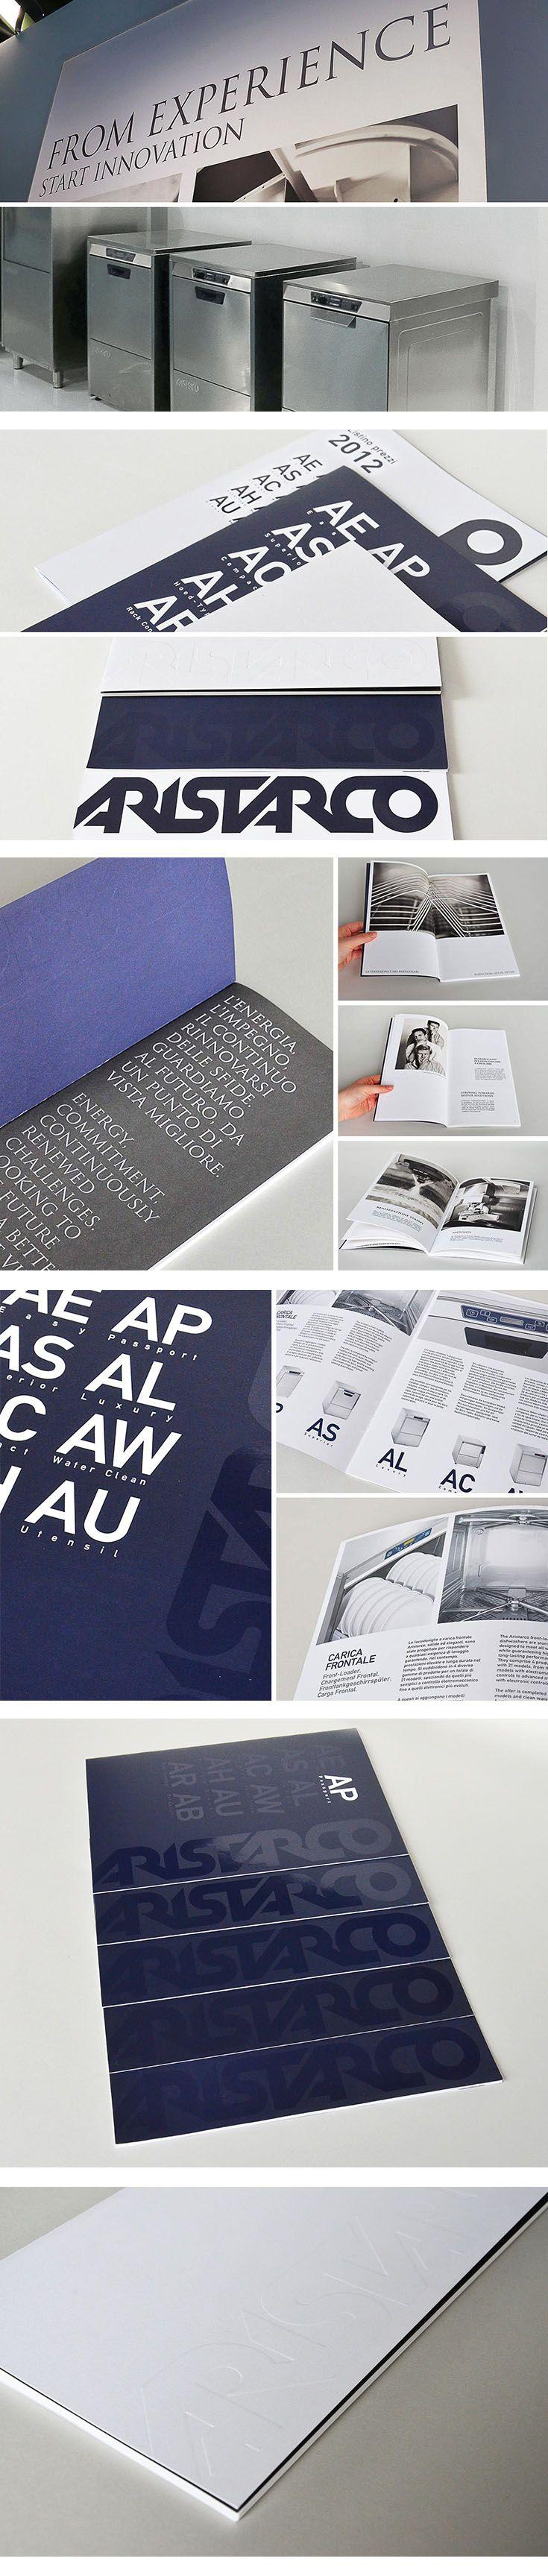 Aristarco, un progetto #effADV - Aristarco, effADV project - #printing #print #catalogue #branding